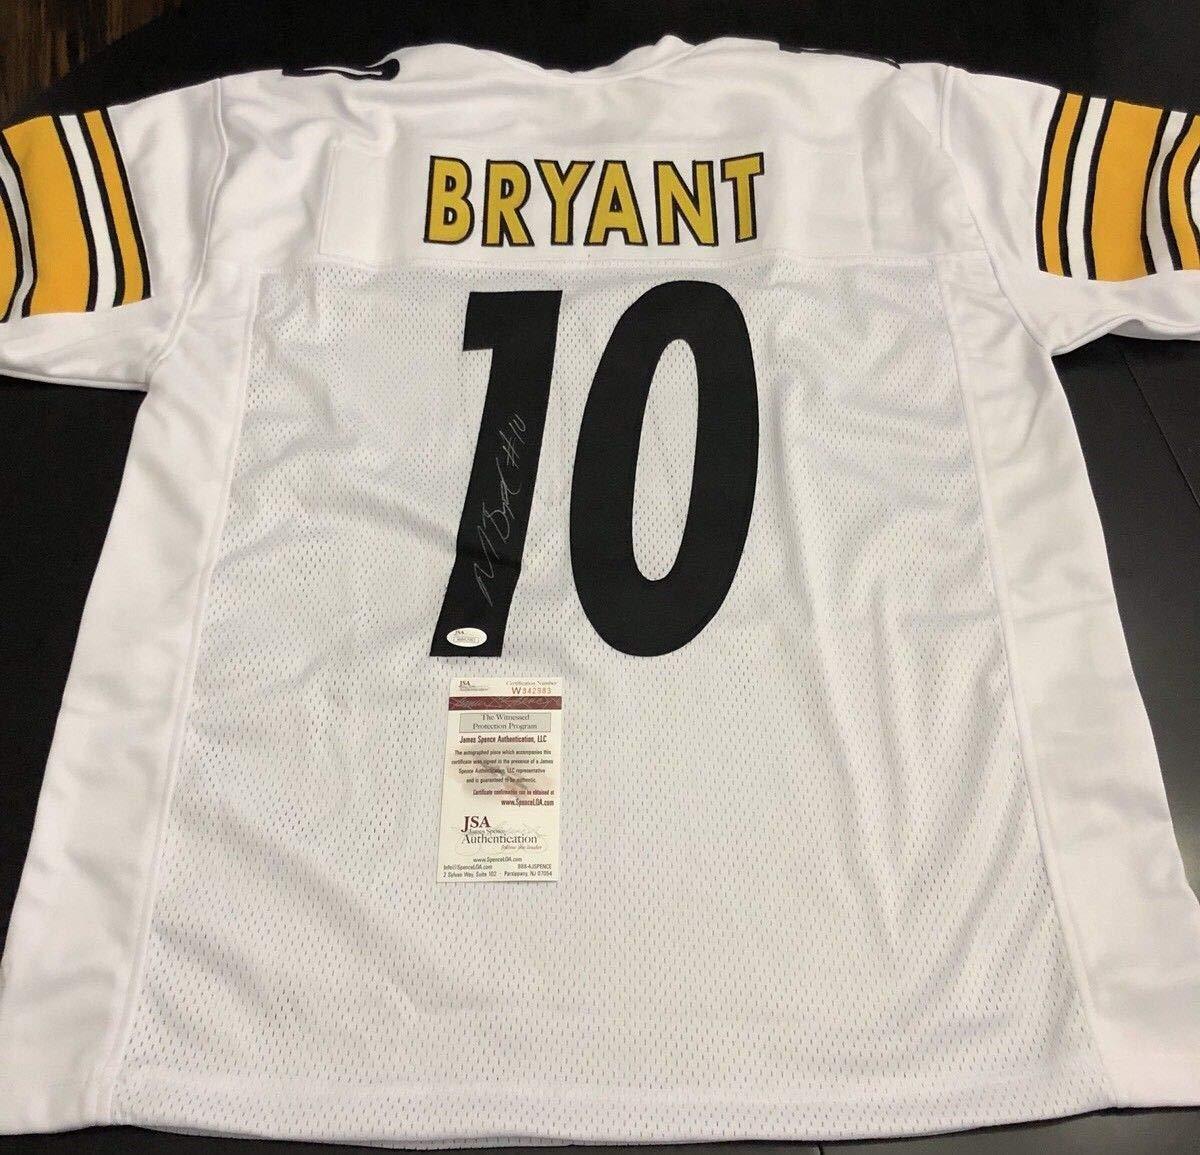 online store 8d88c 8072b Martavis Bryant Autographed Signed Authentic Pittsburgh ...